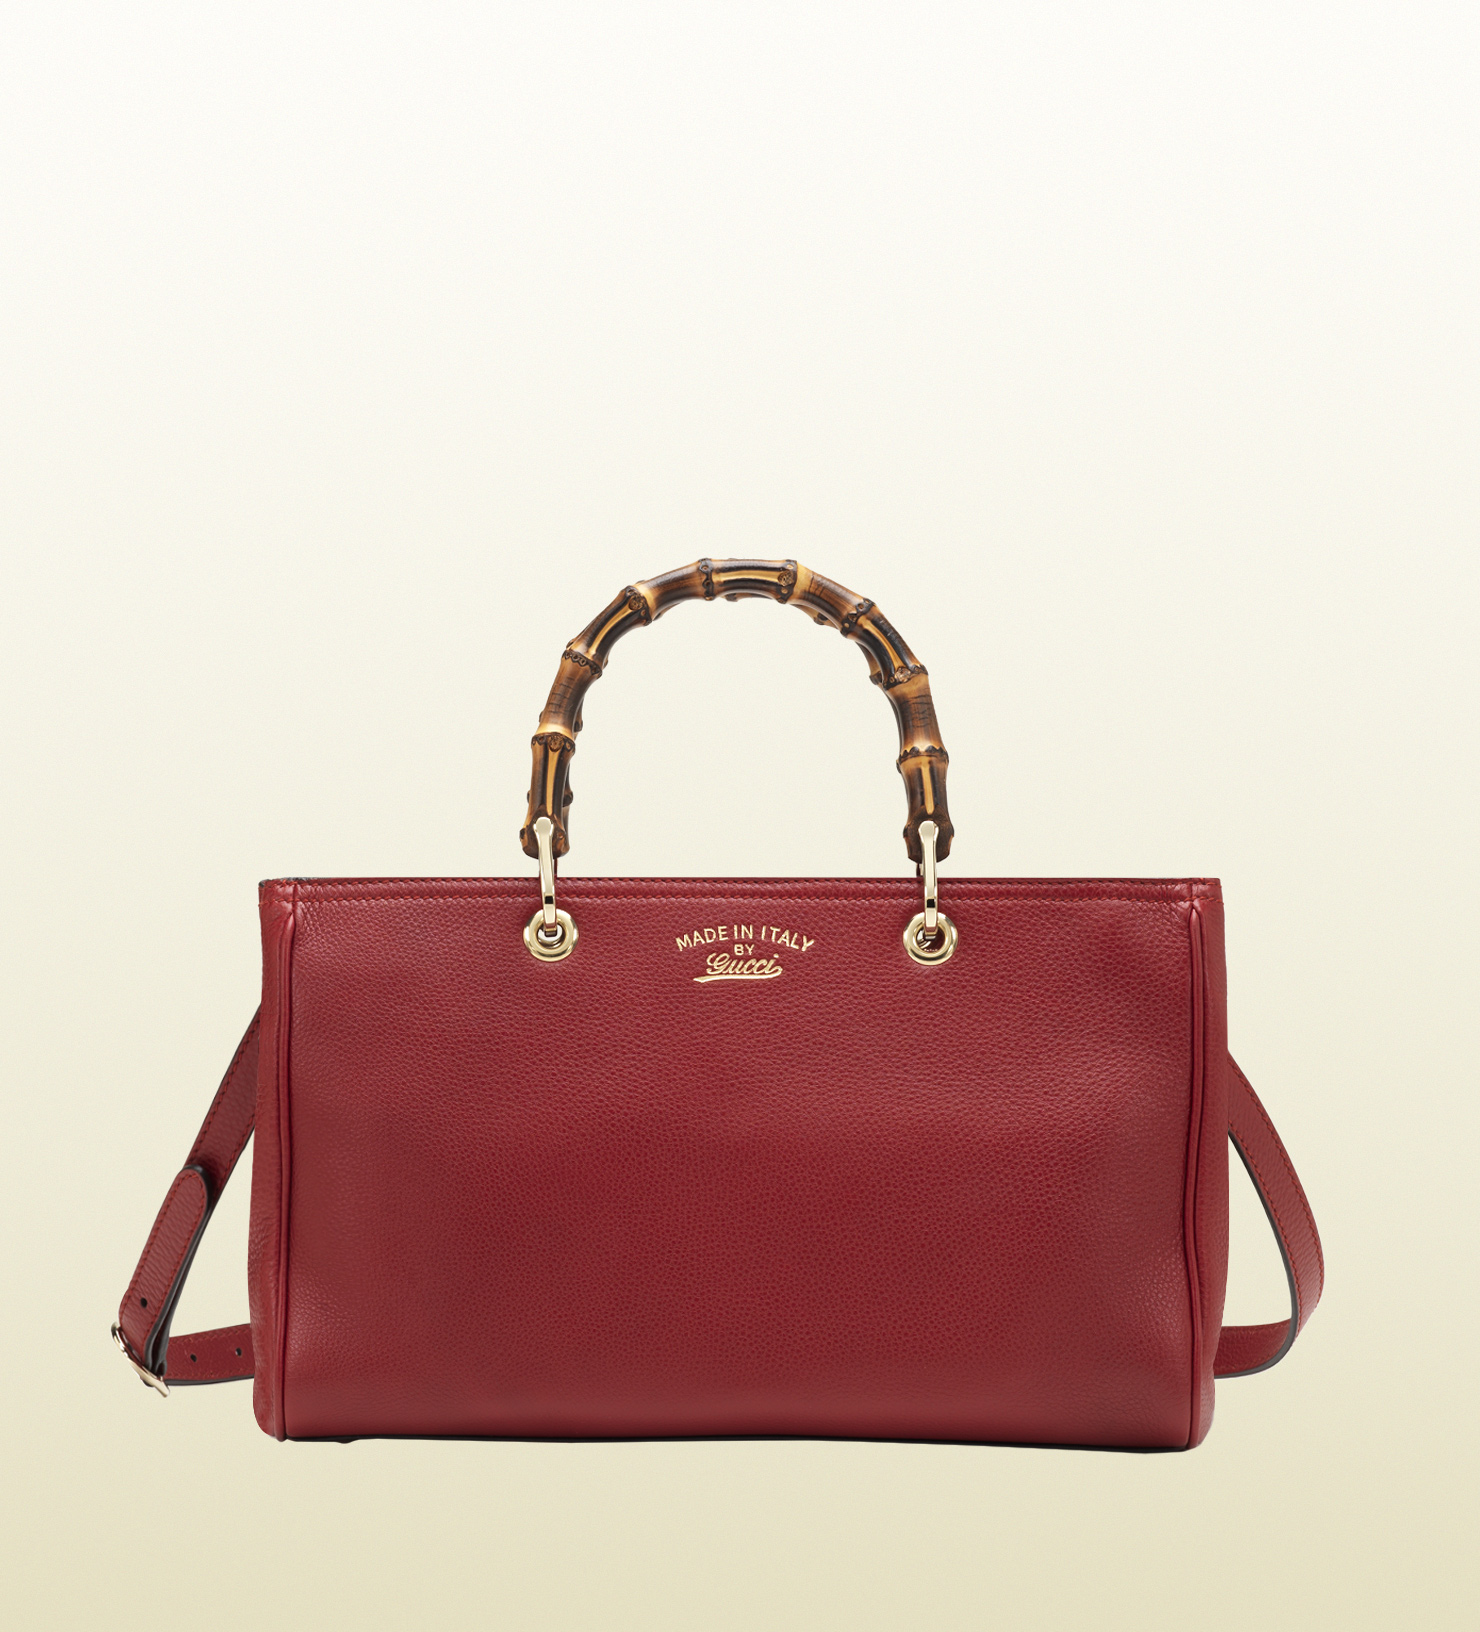 Gucci - bamboo shopper leather tote 323660A7M0G6227